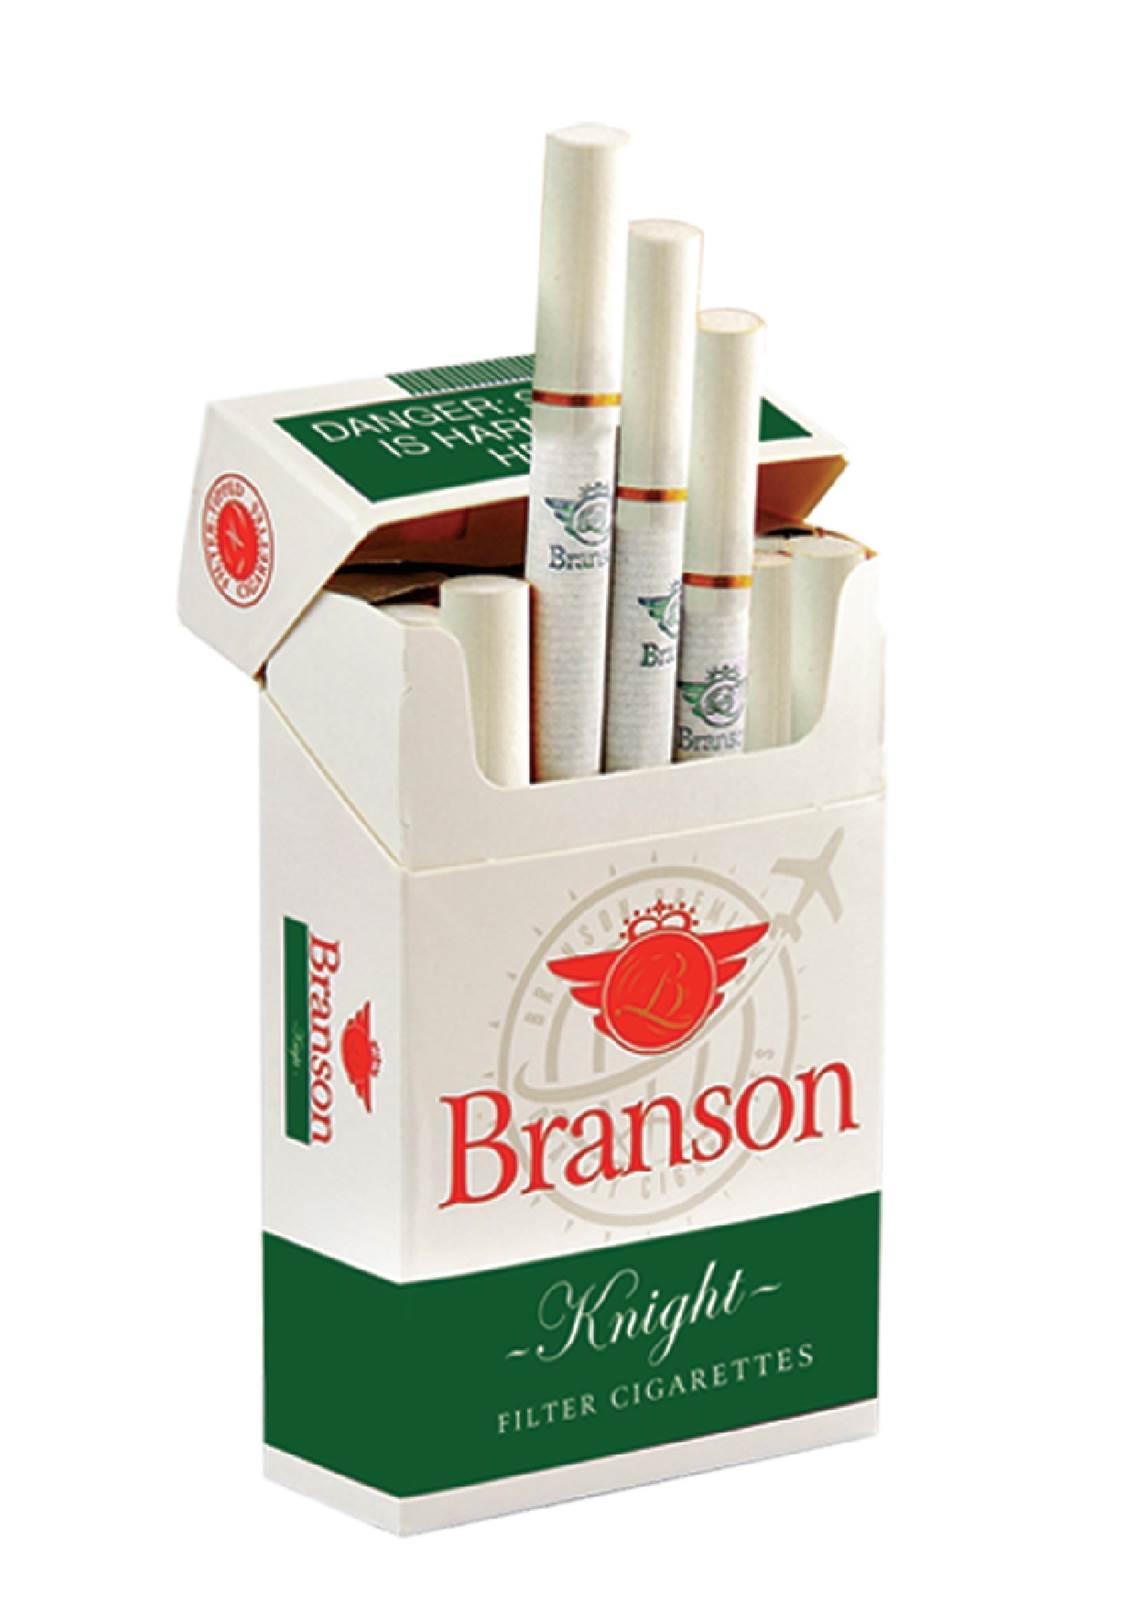 Branson Knight